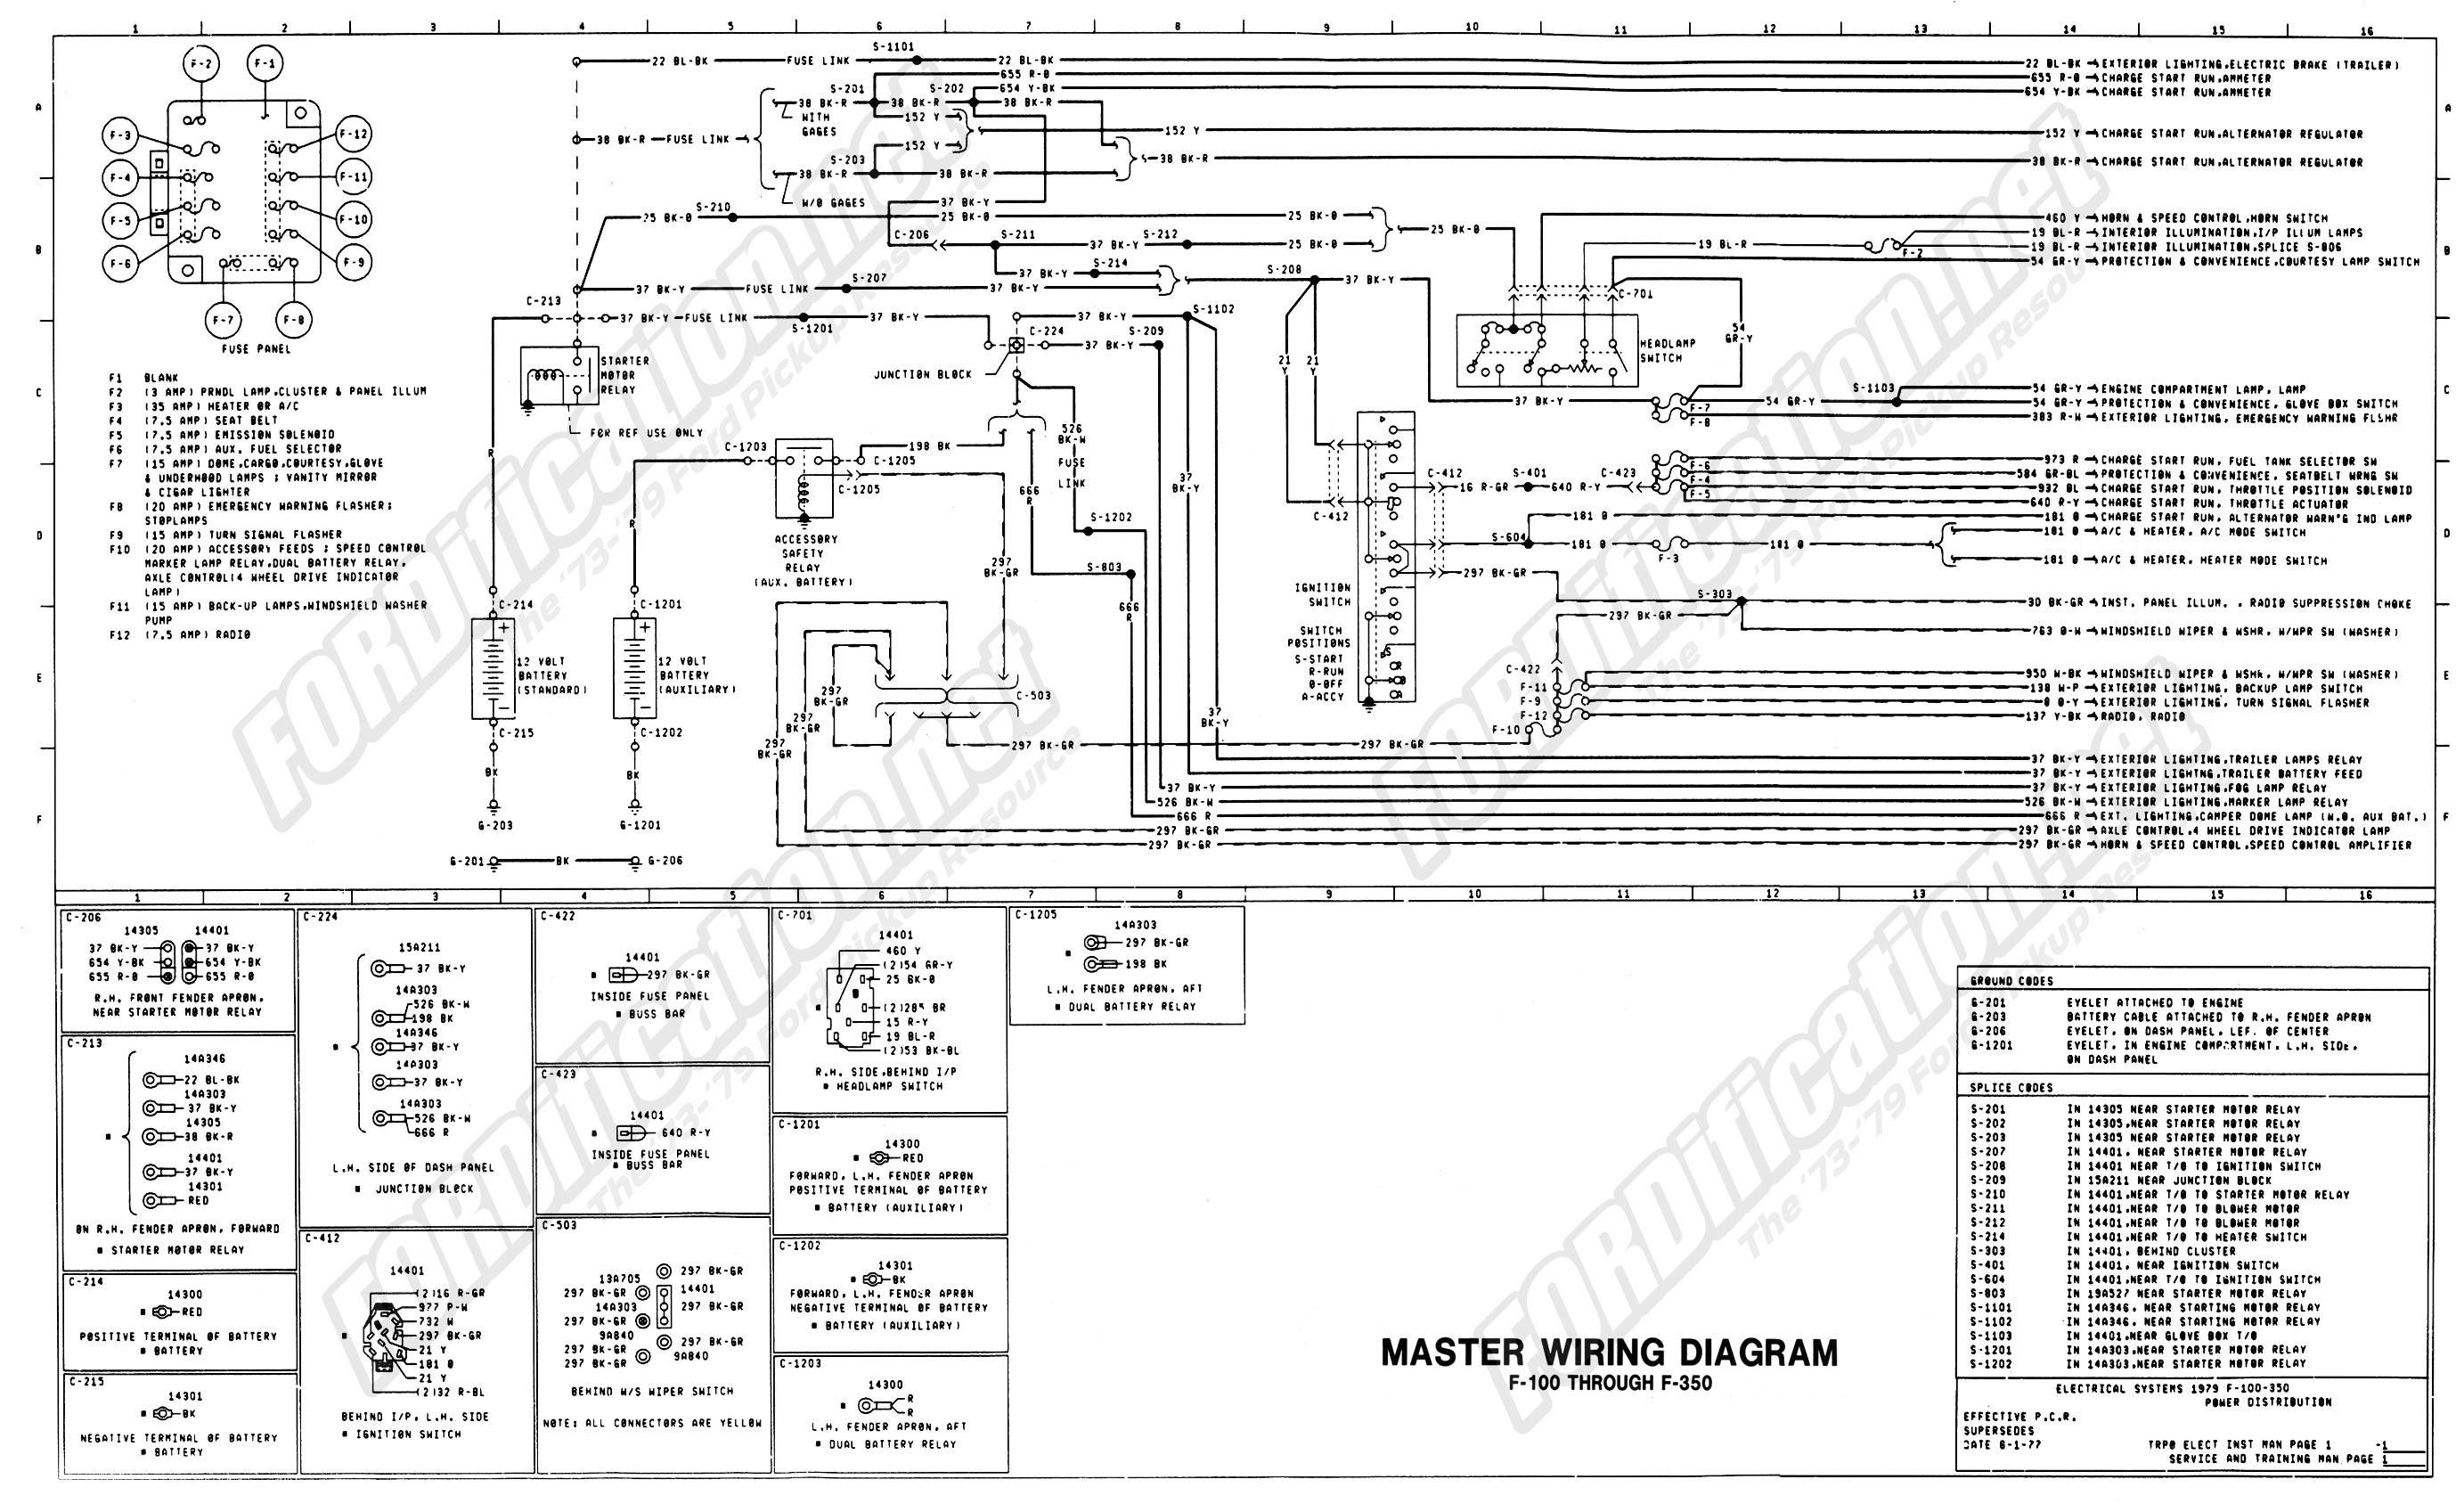 1972 Bronco Alternator Wiring Diagram 1979 F100 Ignition Switch Wiring Diagram Positions ford Of 1972 Bronco Alternator Wiring Diagram